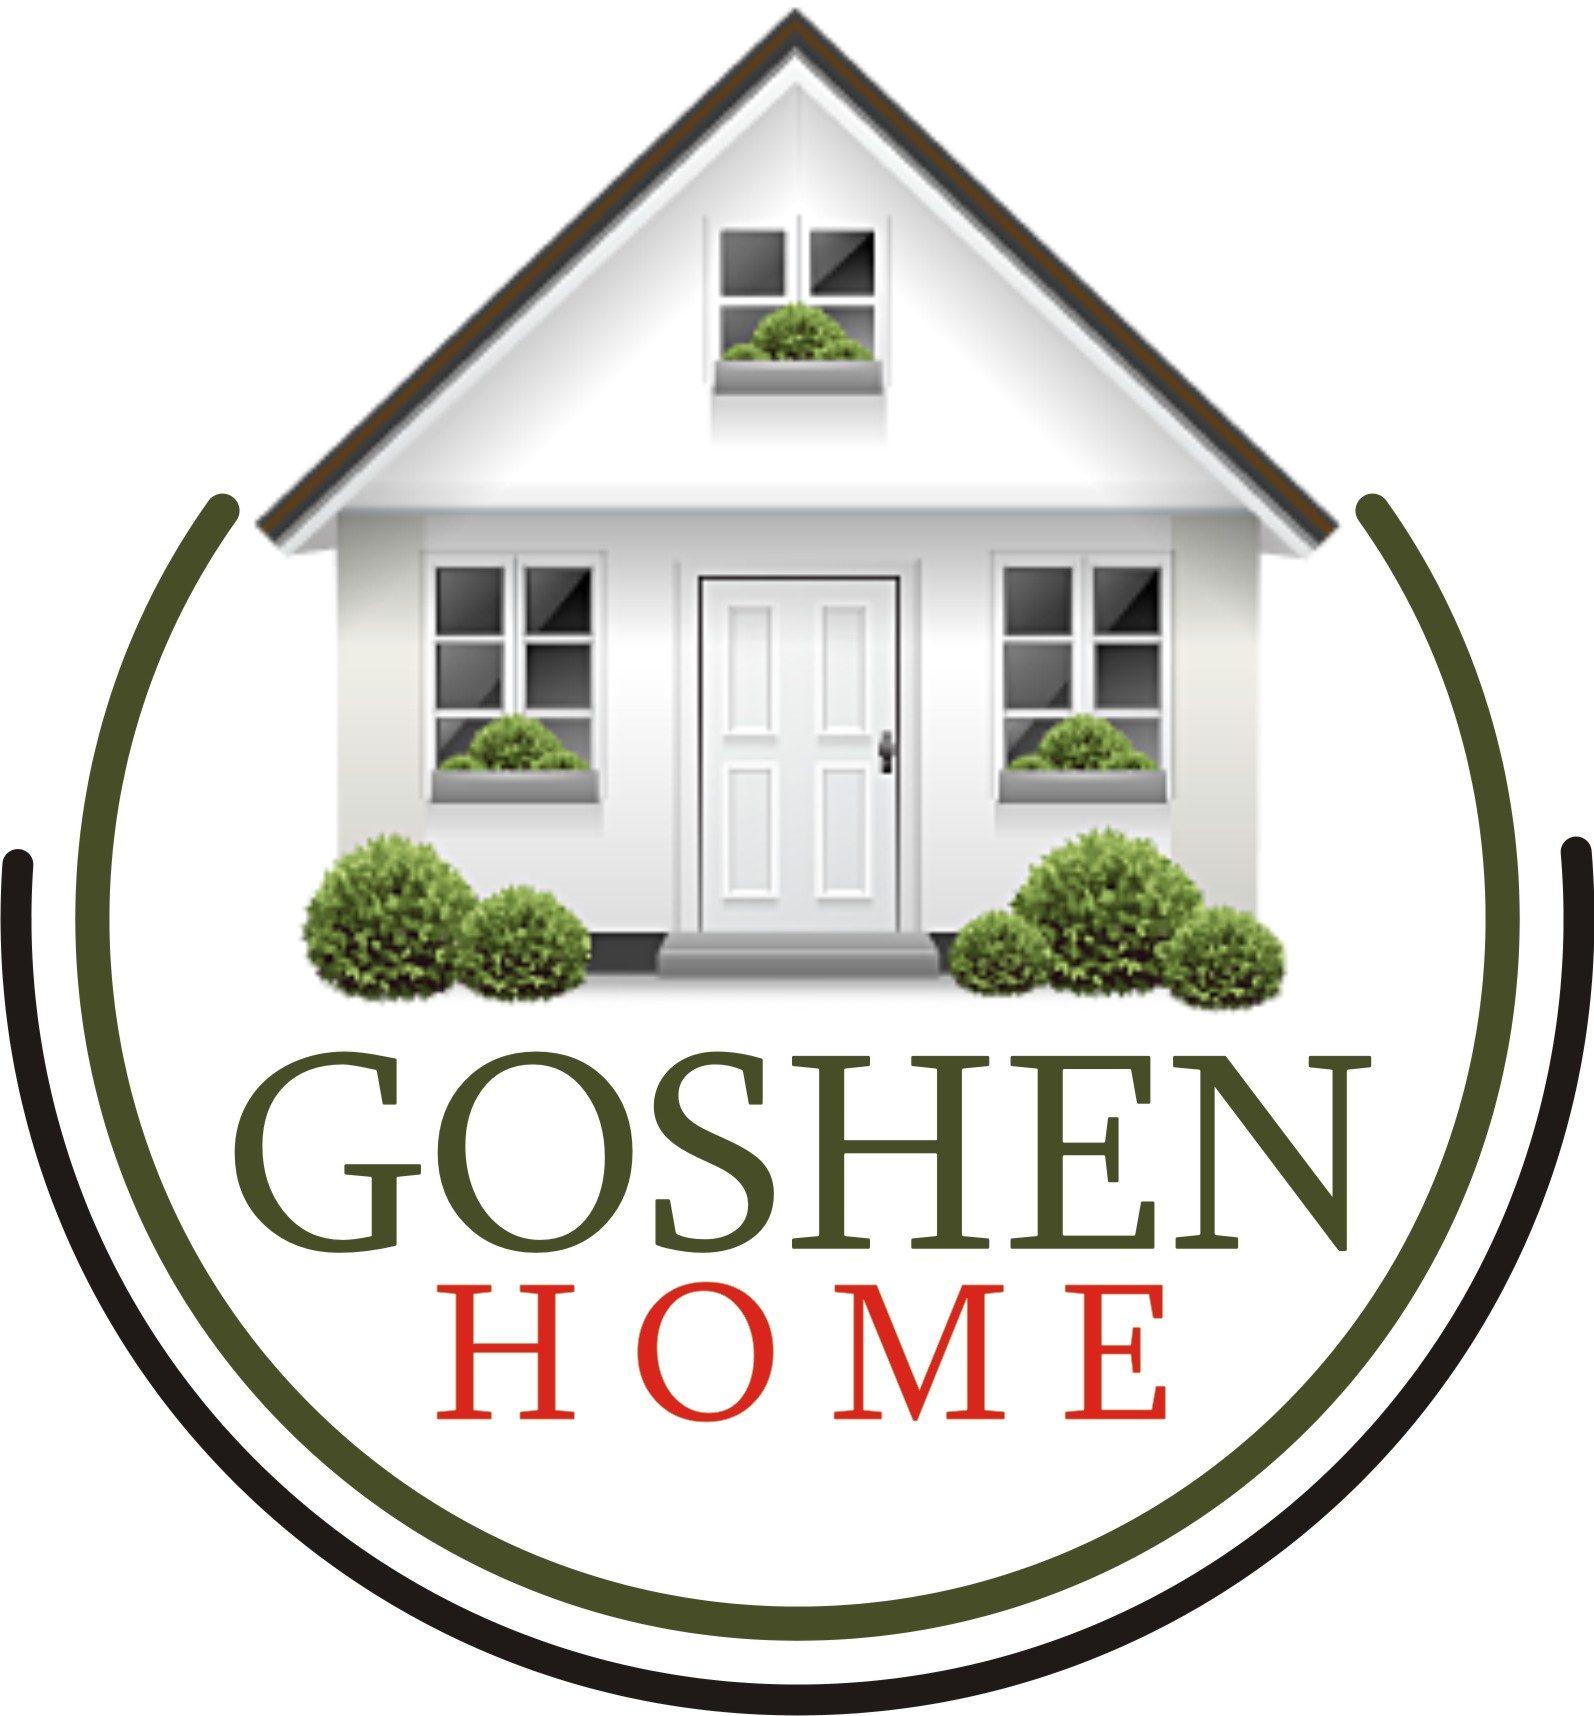 Goshen Home